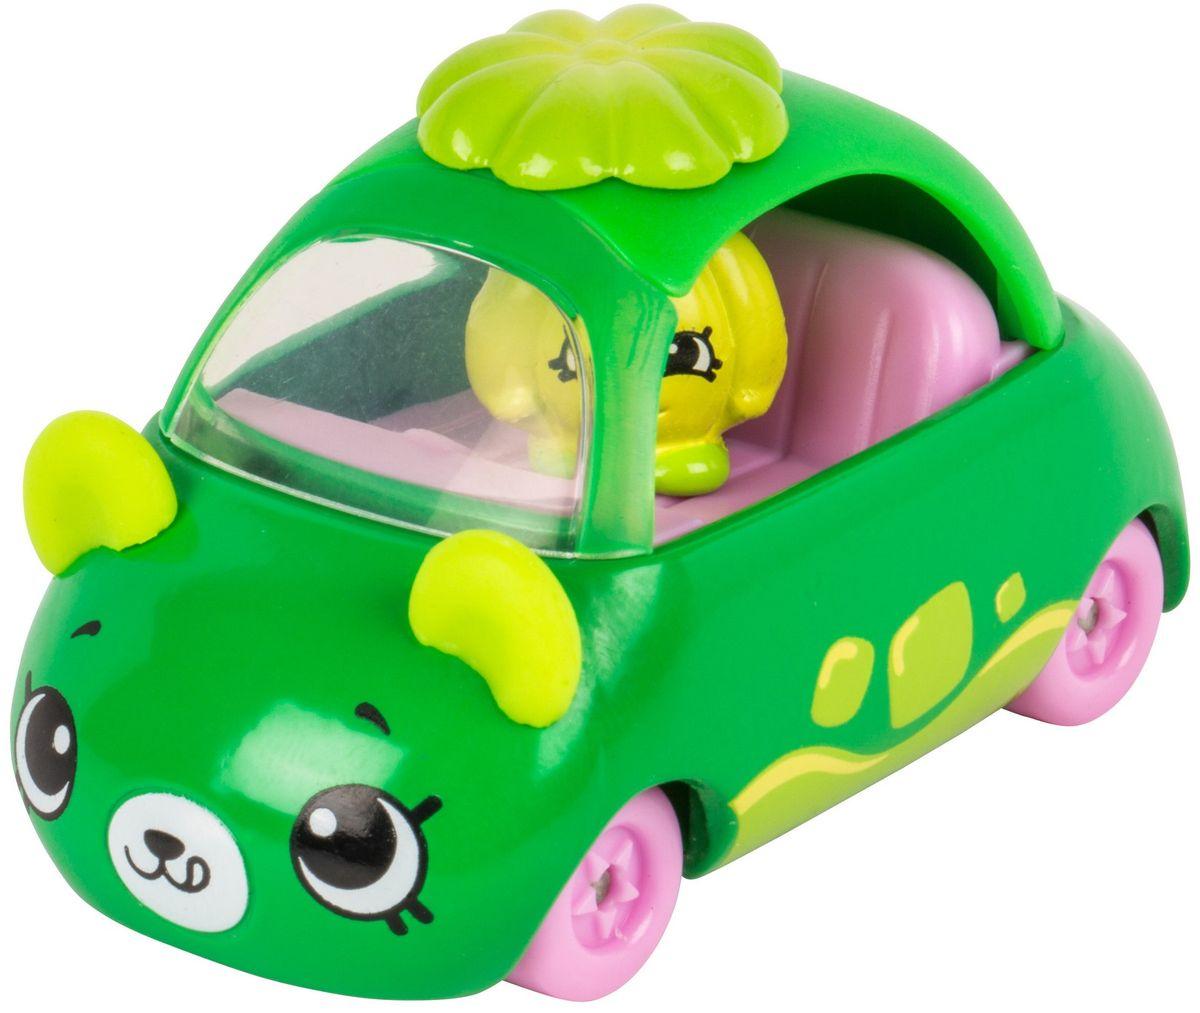 Moose Игровой набор Cutie Car с мини-фигуркой Shopkins S1 56592/ast56742 moose брелок poppy corn shopkins